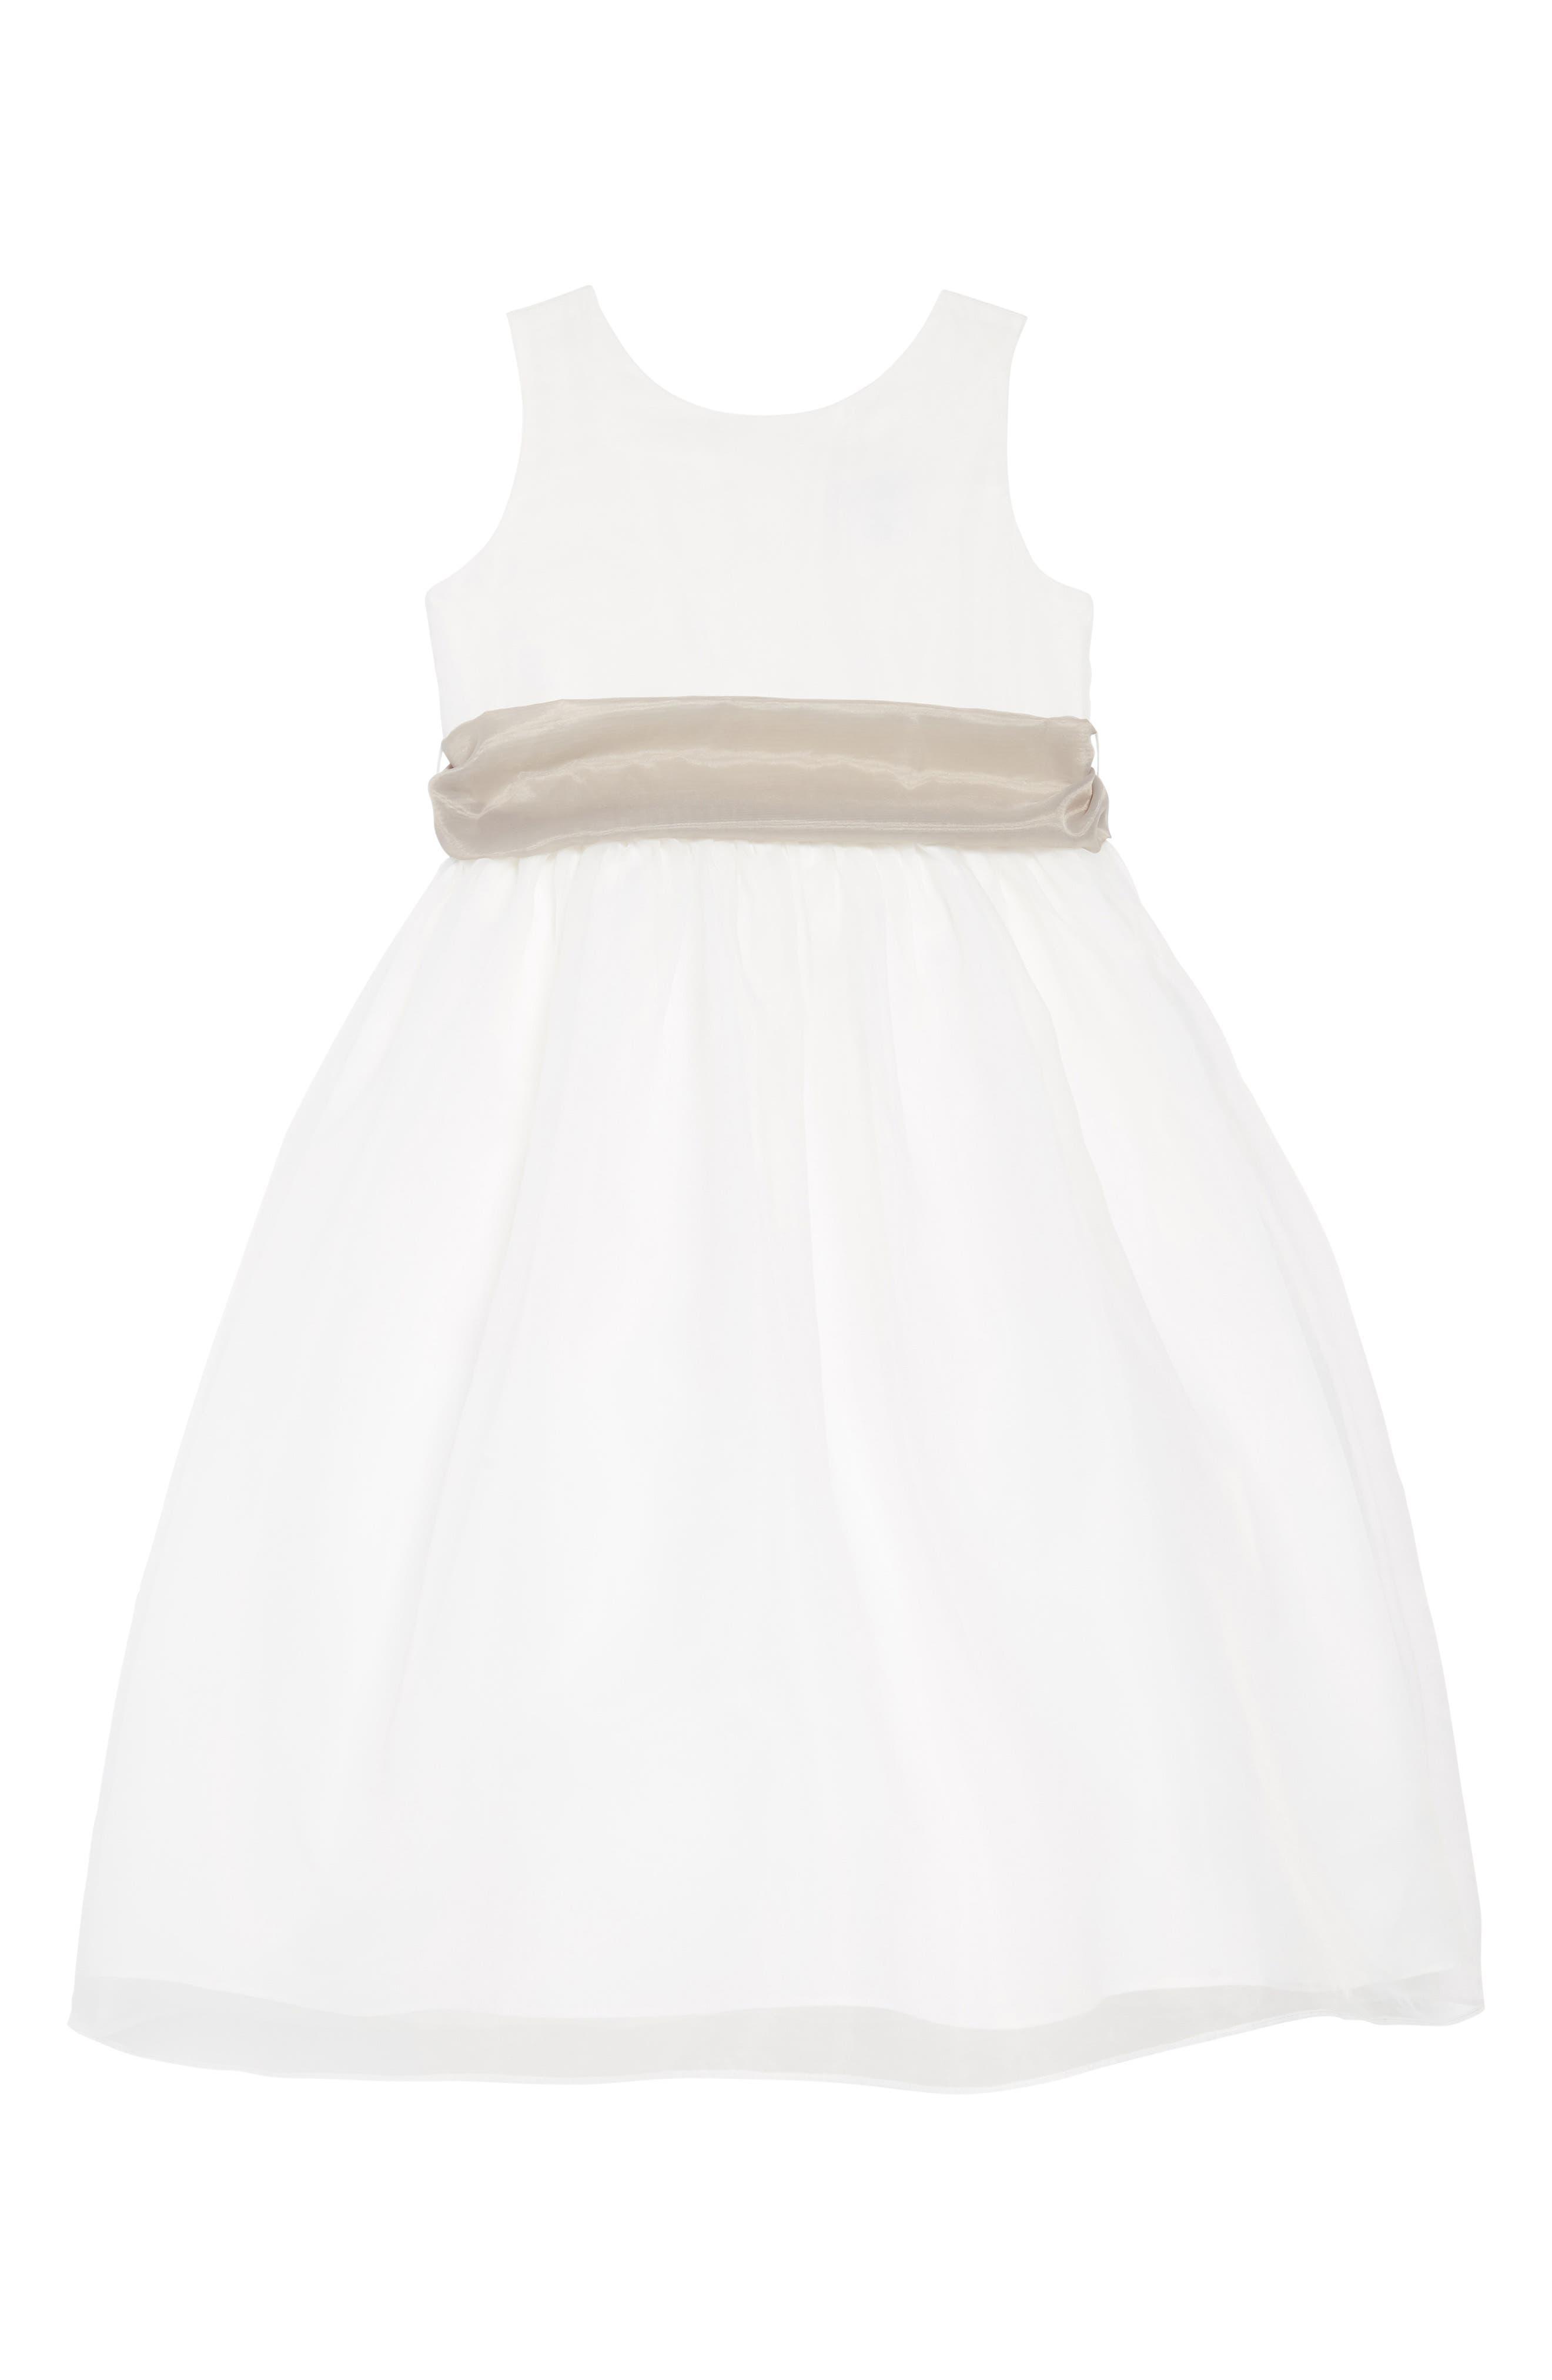 Sleeveless Organza Dress,                             Main thumbnail 1, color,                             Ivory/ pewter